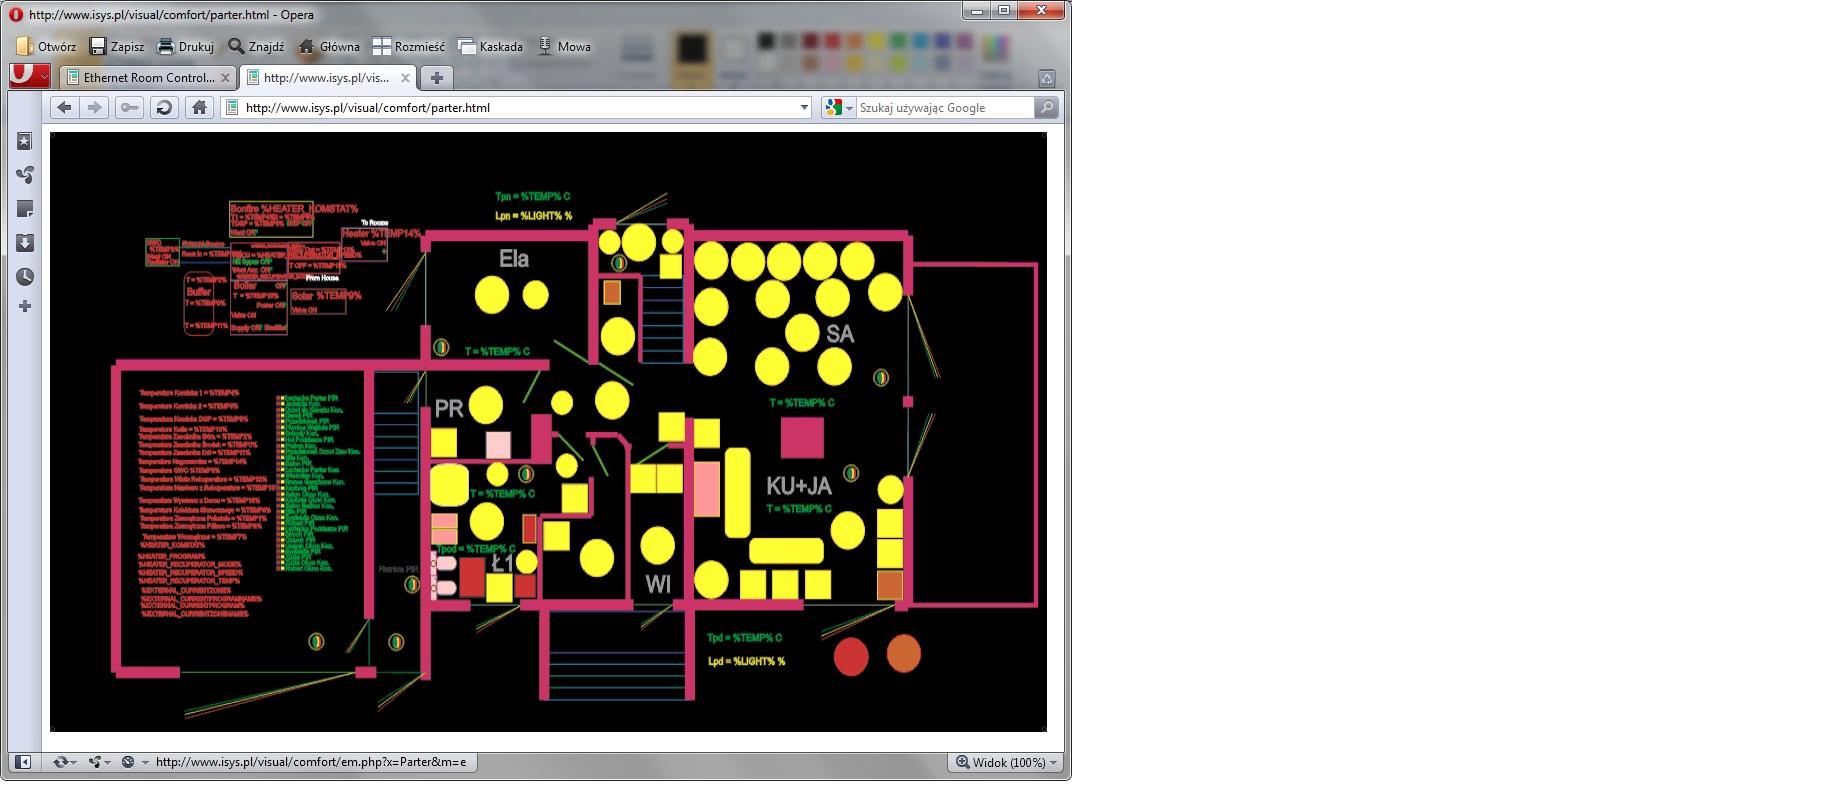 Інтелектуальне управління Головна браузера EHouse (HTML карти)